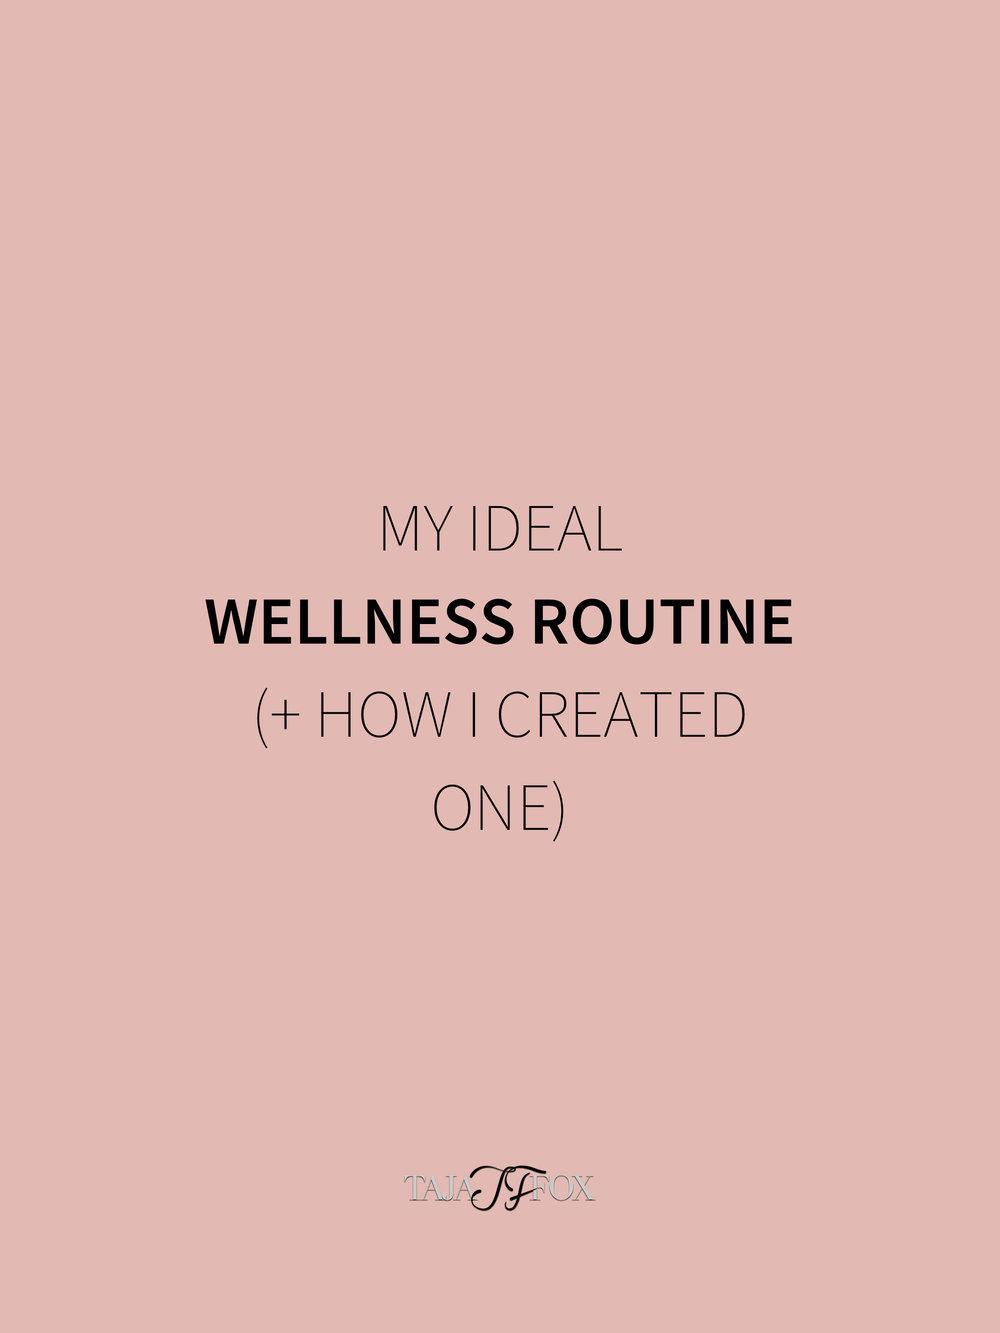 wellness routine tajafox.com.jpg